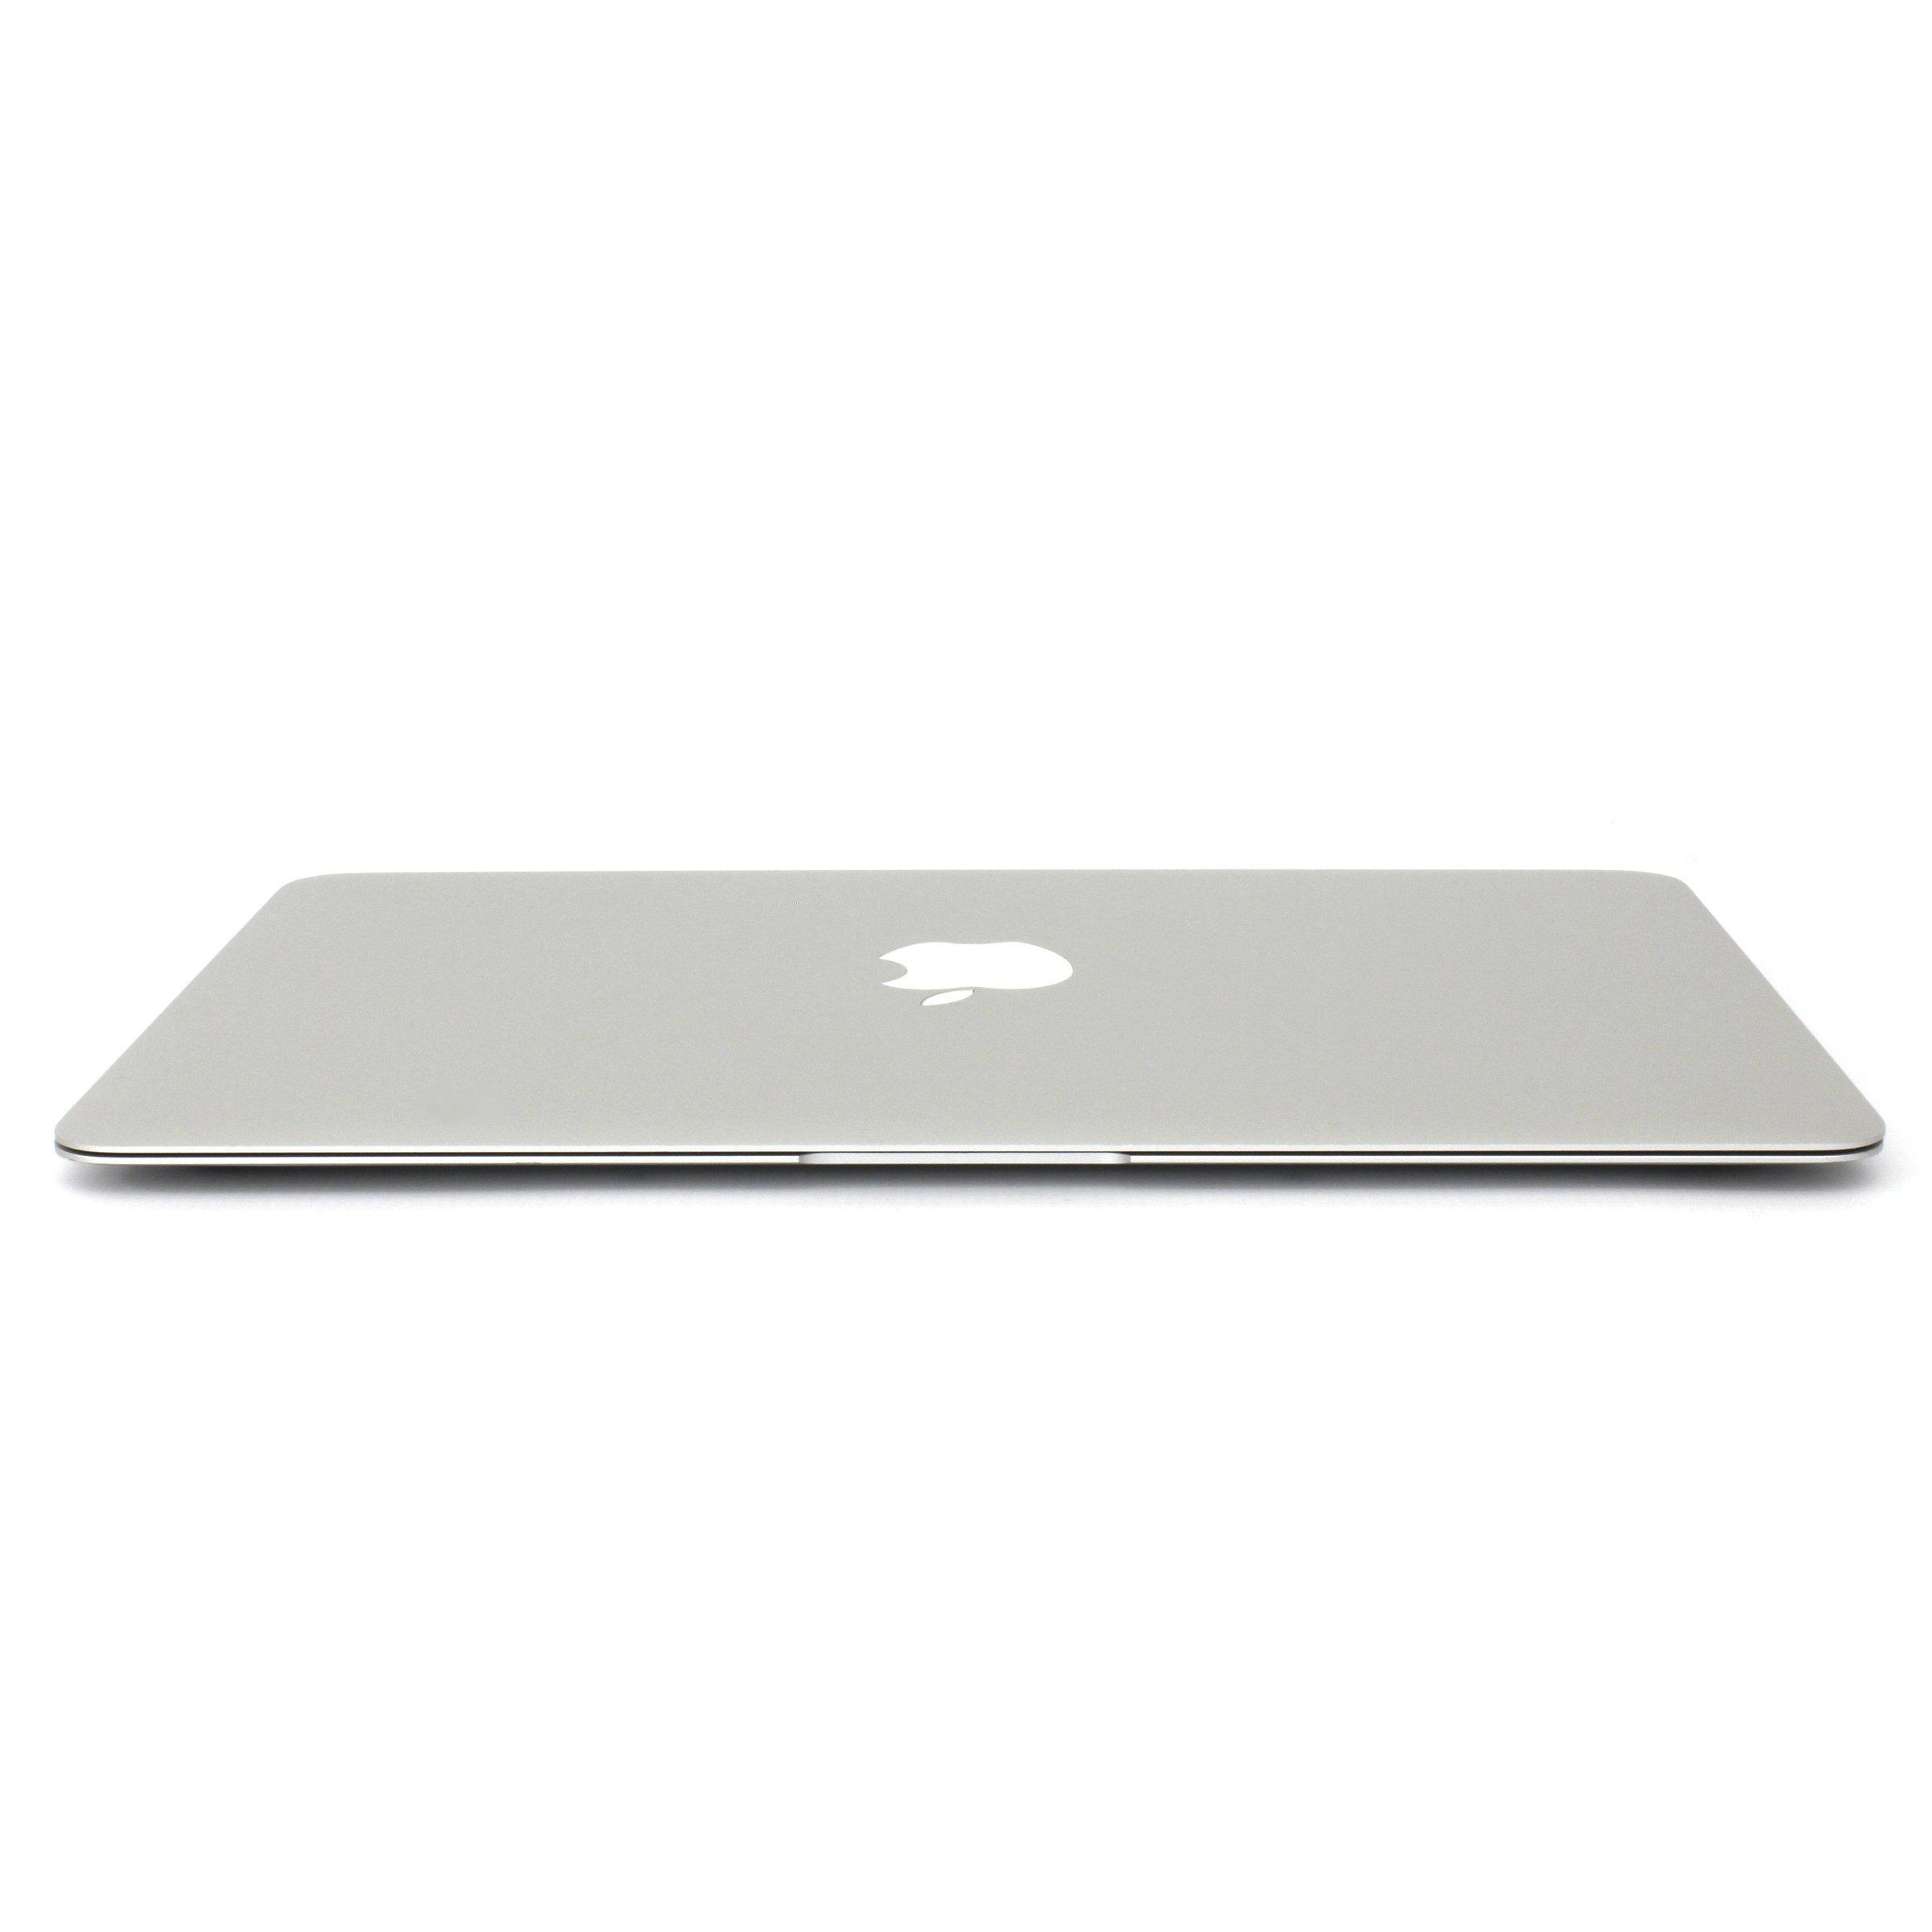 MacBook Air 11,6-tum (2010) - Core 2 Duo - 2GB - SSD 64 GB QWERTY - Engelska (USA)